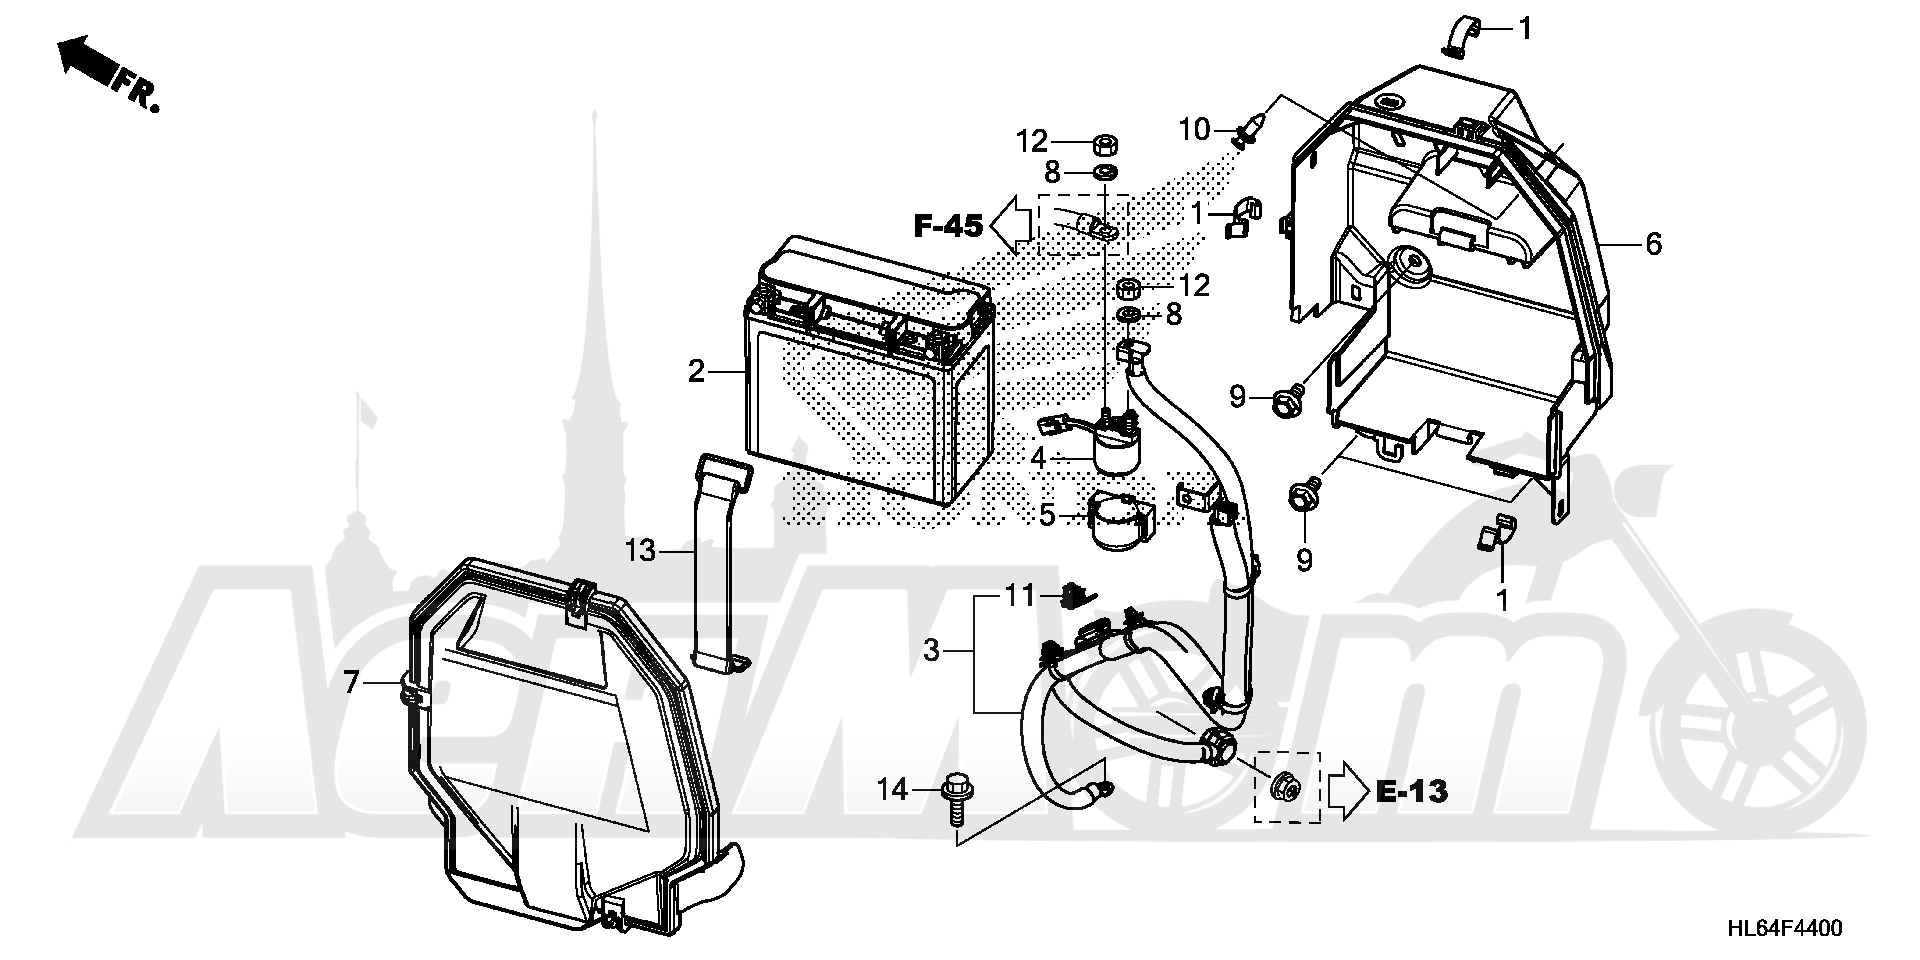 Запчасти для Квадроцикла Honda 2019 SXS1000S2R Раздел: BATTERY   аккумулятор